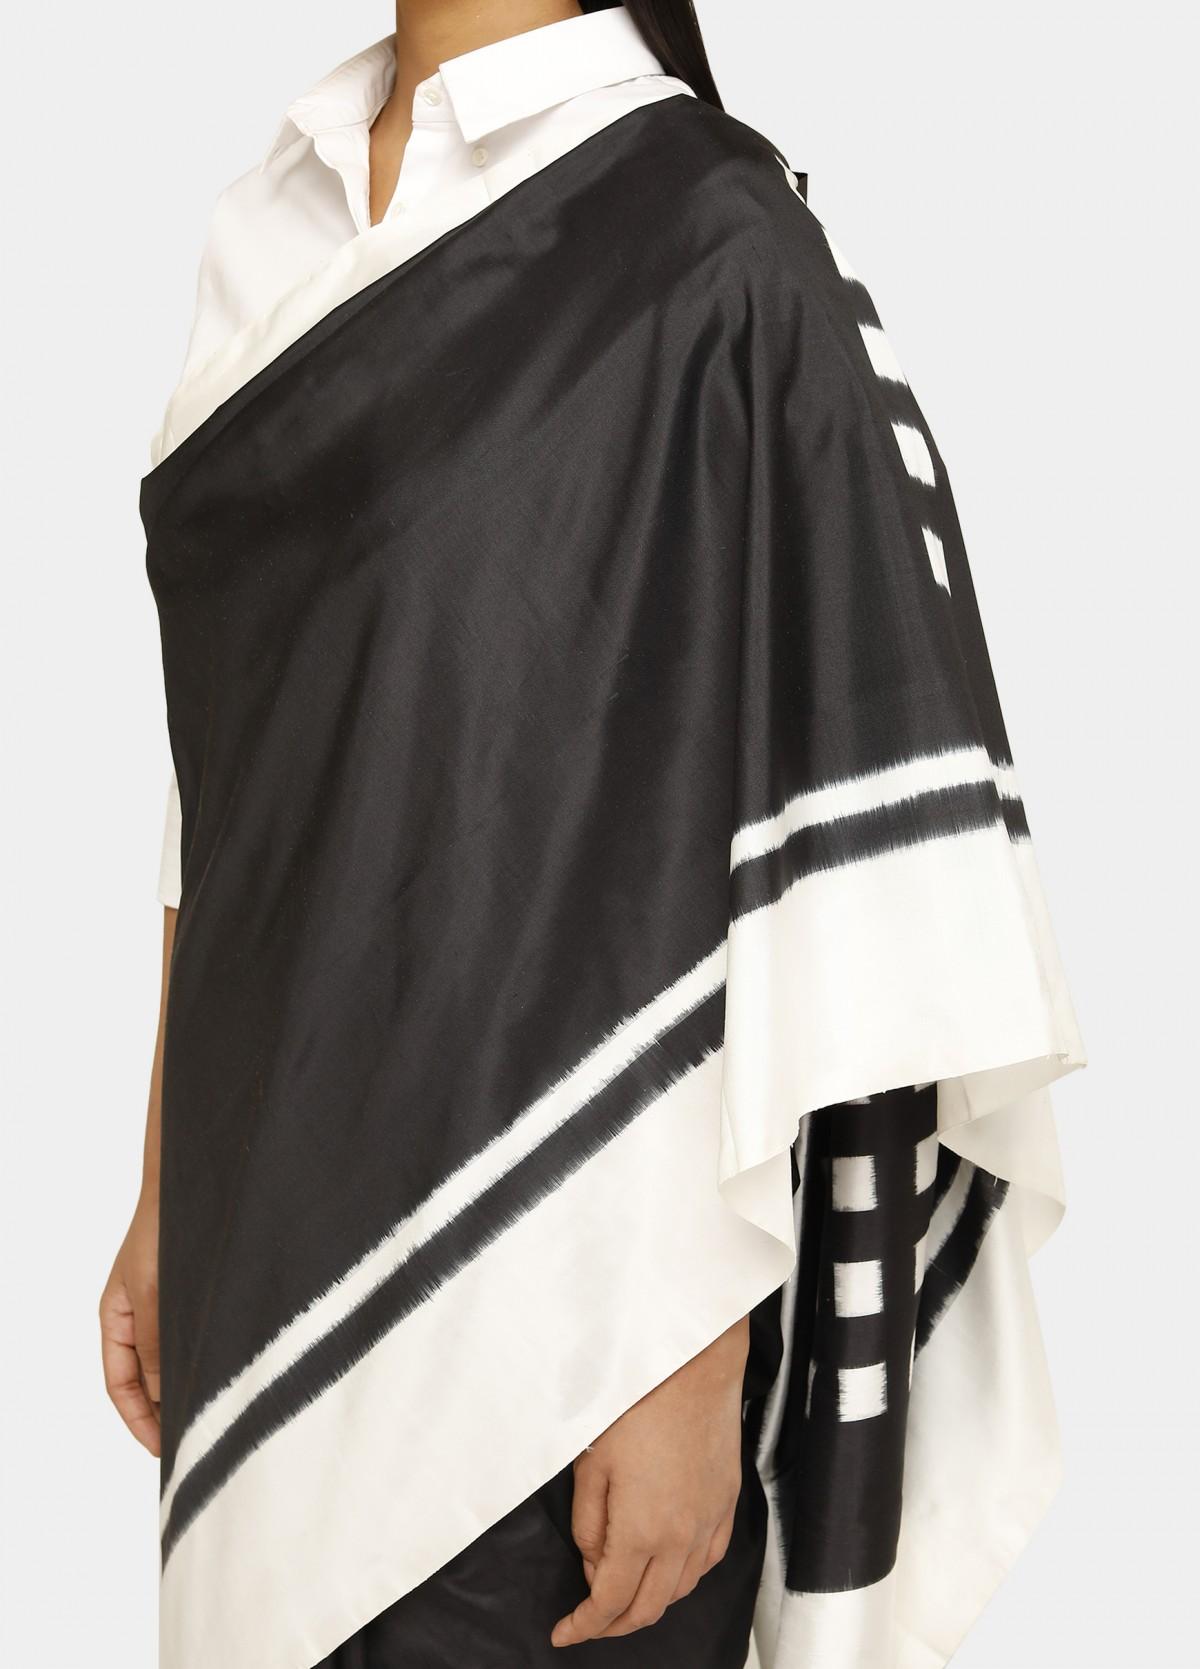 The Chaupad Sari